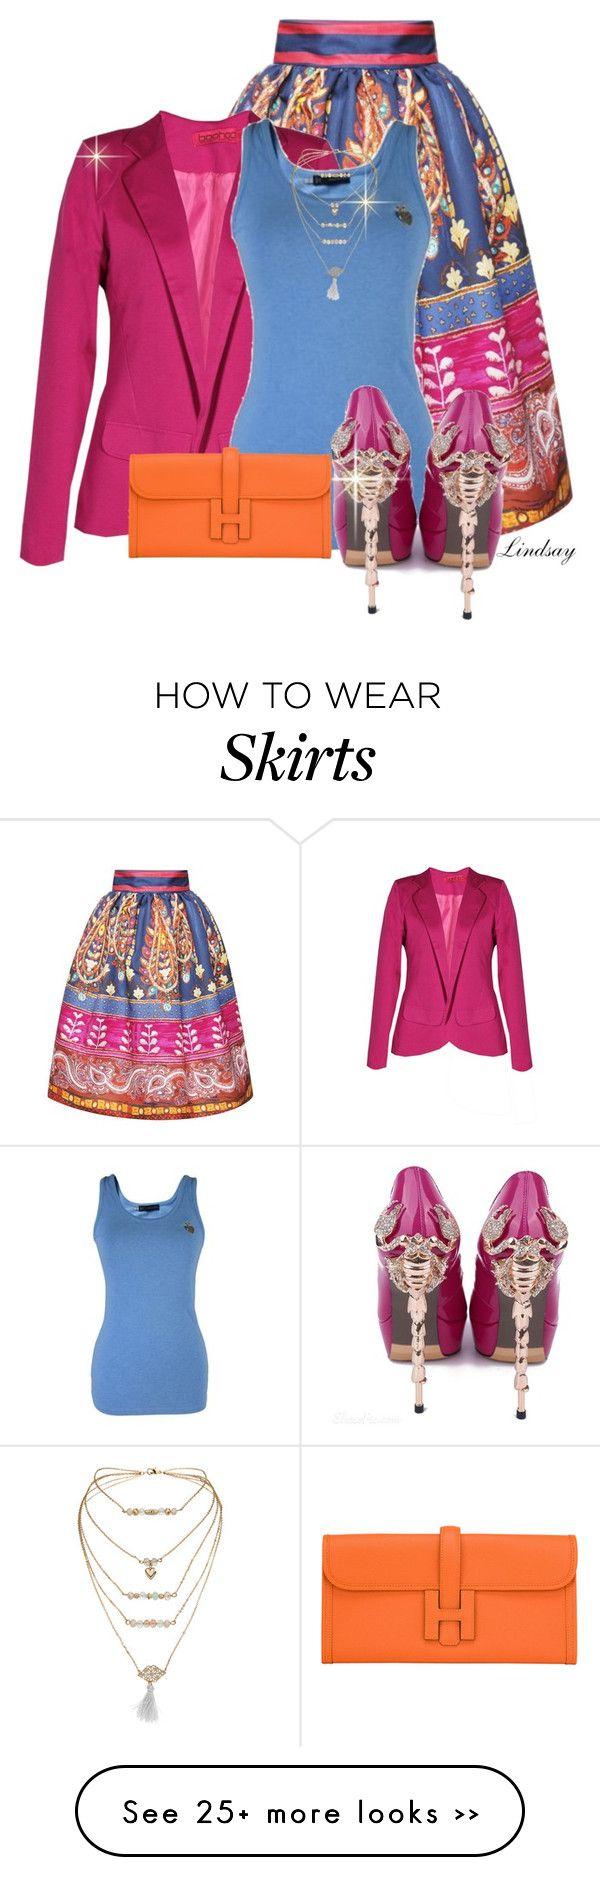 """Stella Jean Grand Rapids Skirt"" by lindsayd78 on Polyvore"